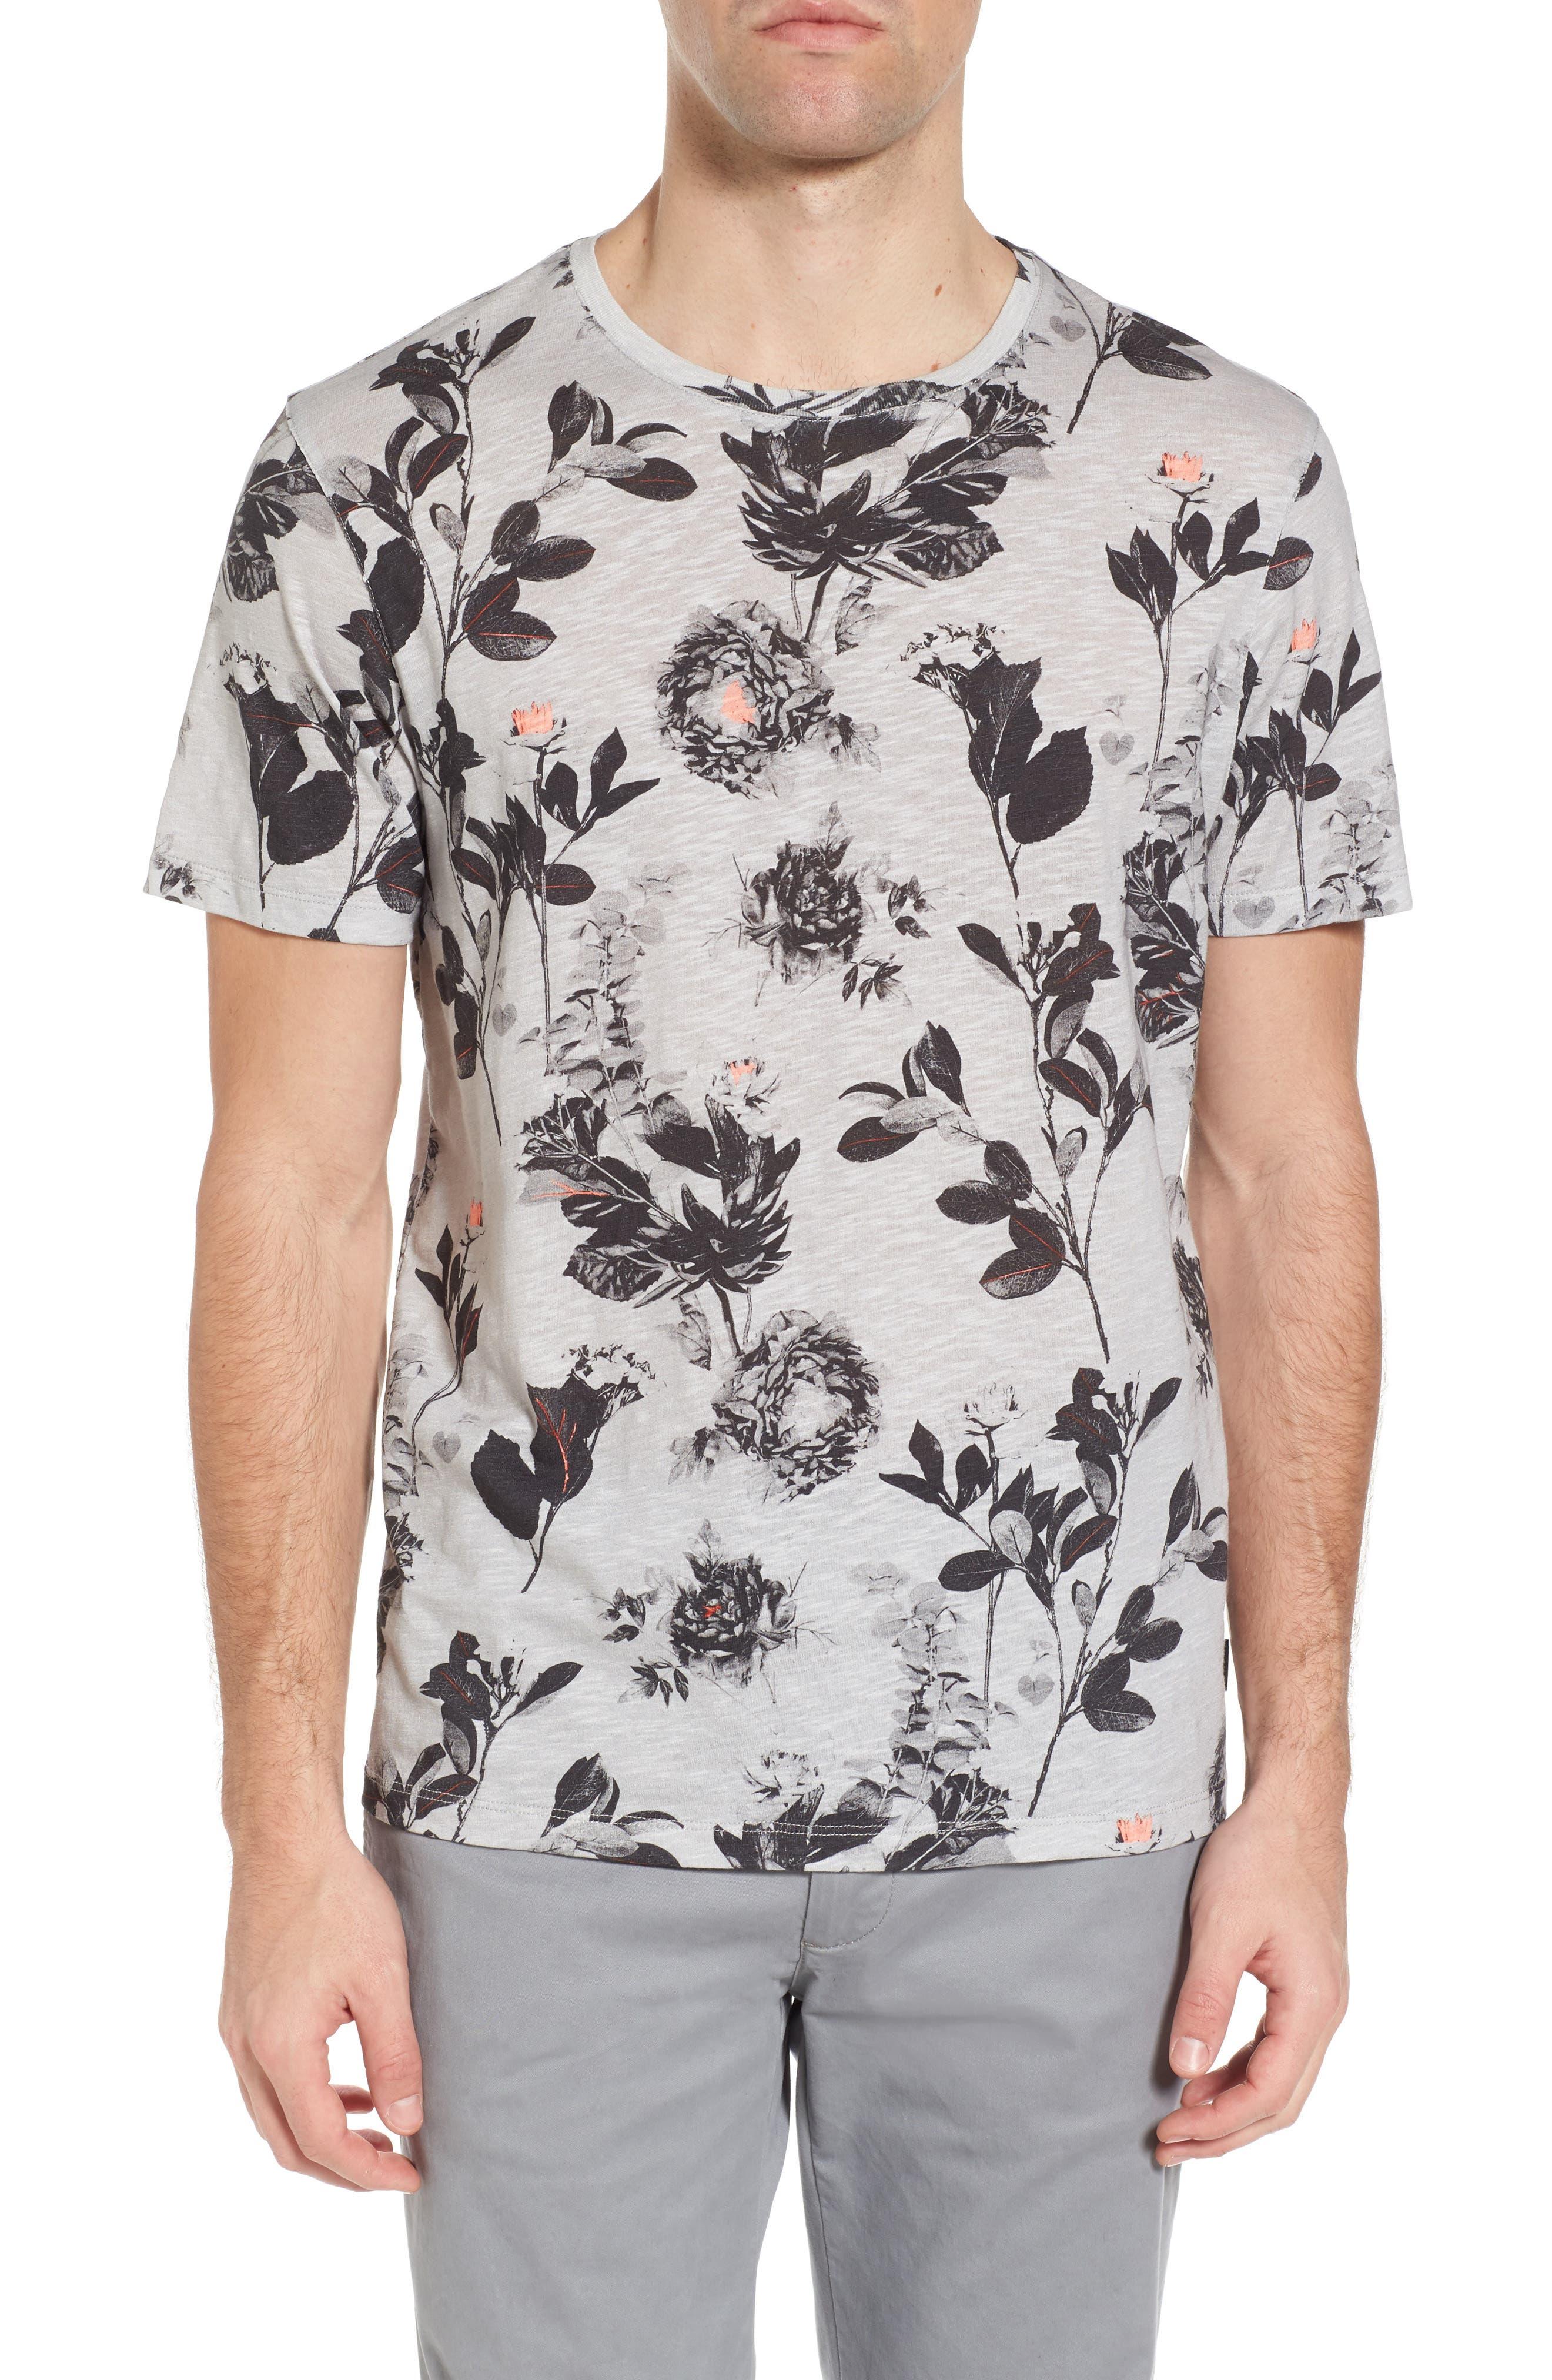 Doberma Trim Fit Floral Print T-Shirt,                         Main,                         color,